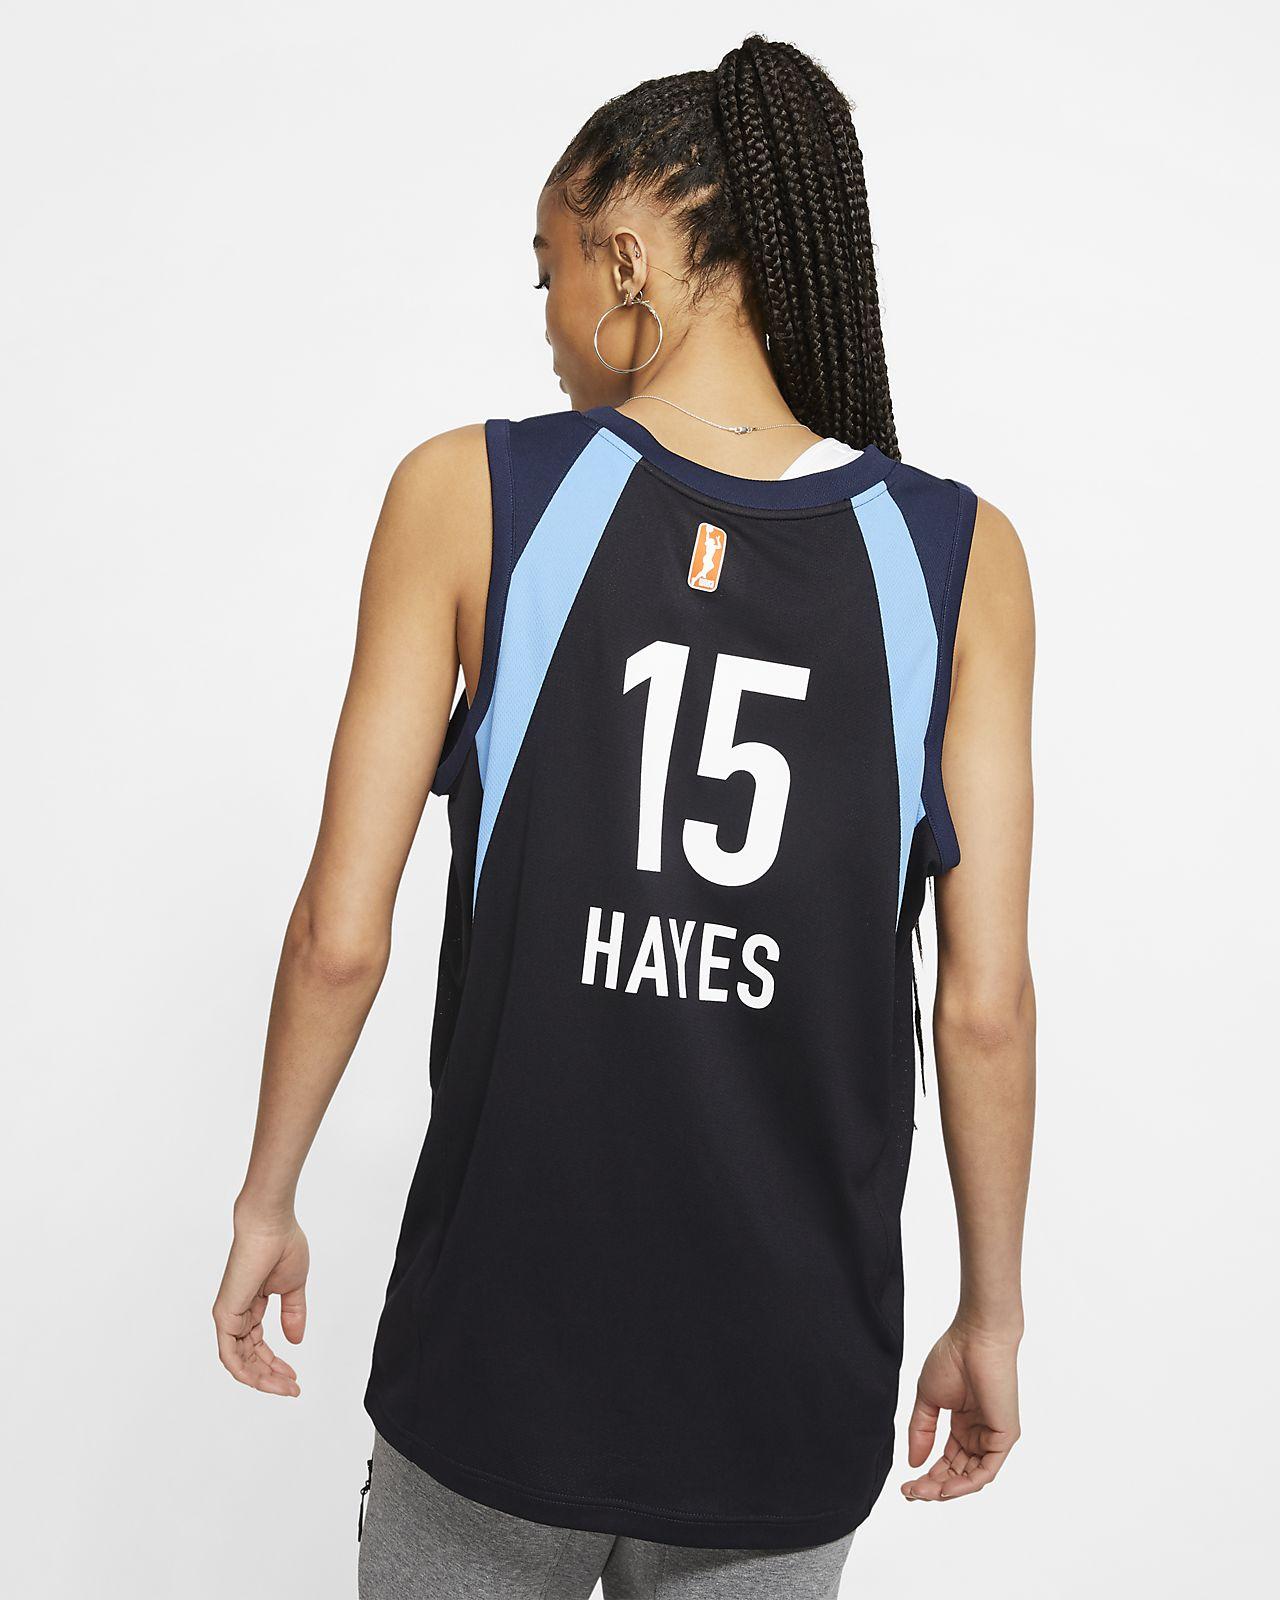 0310b8e9f05 Tiffany Hayes Atlanta Dream Nike WNBA Basketball Jersey. Nike.com